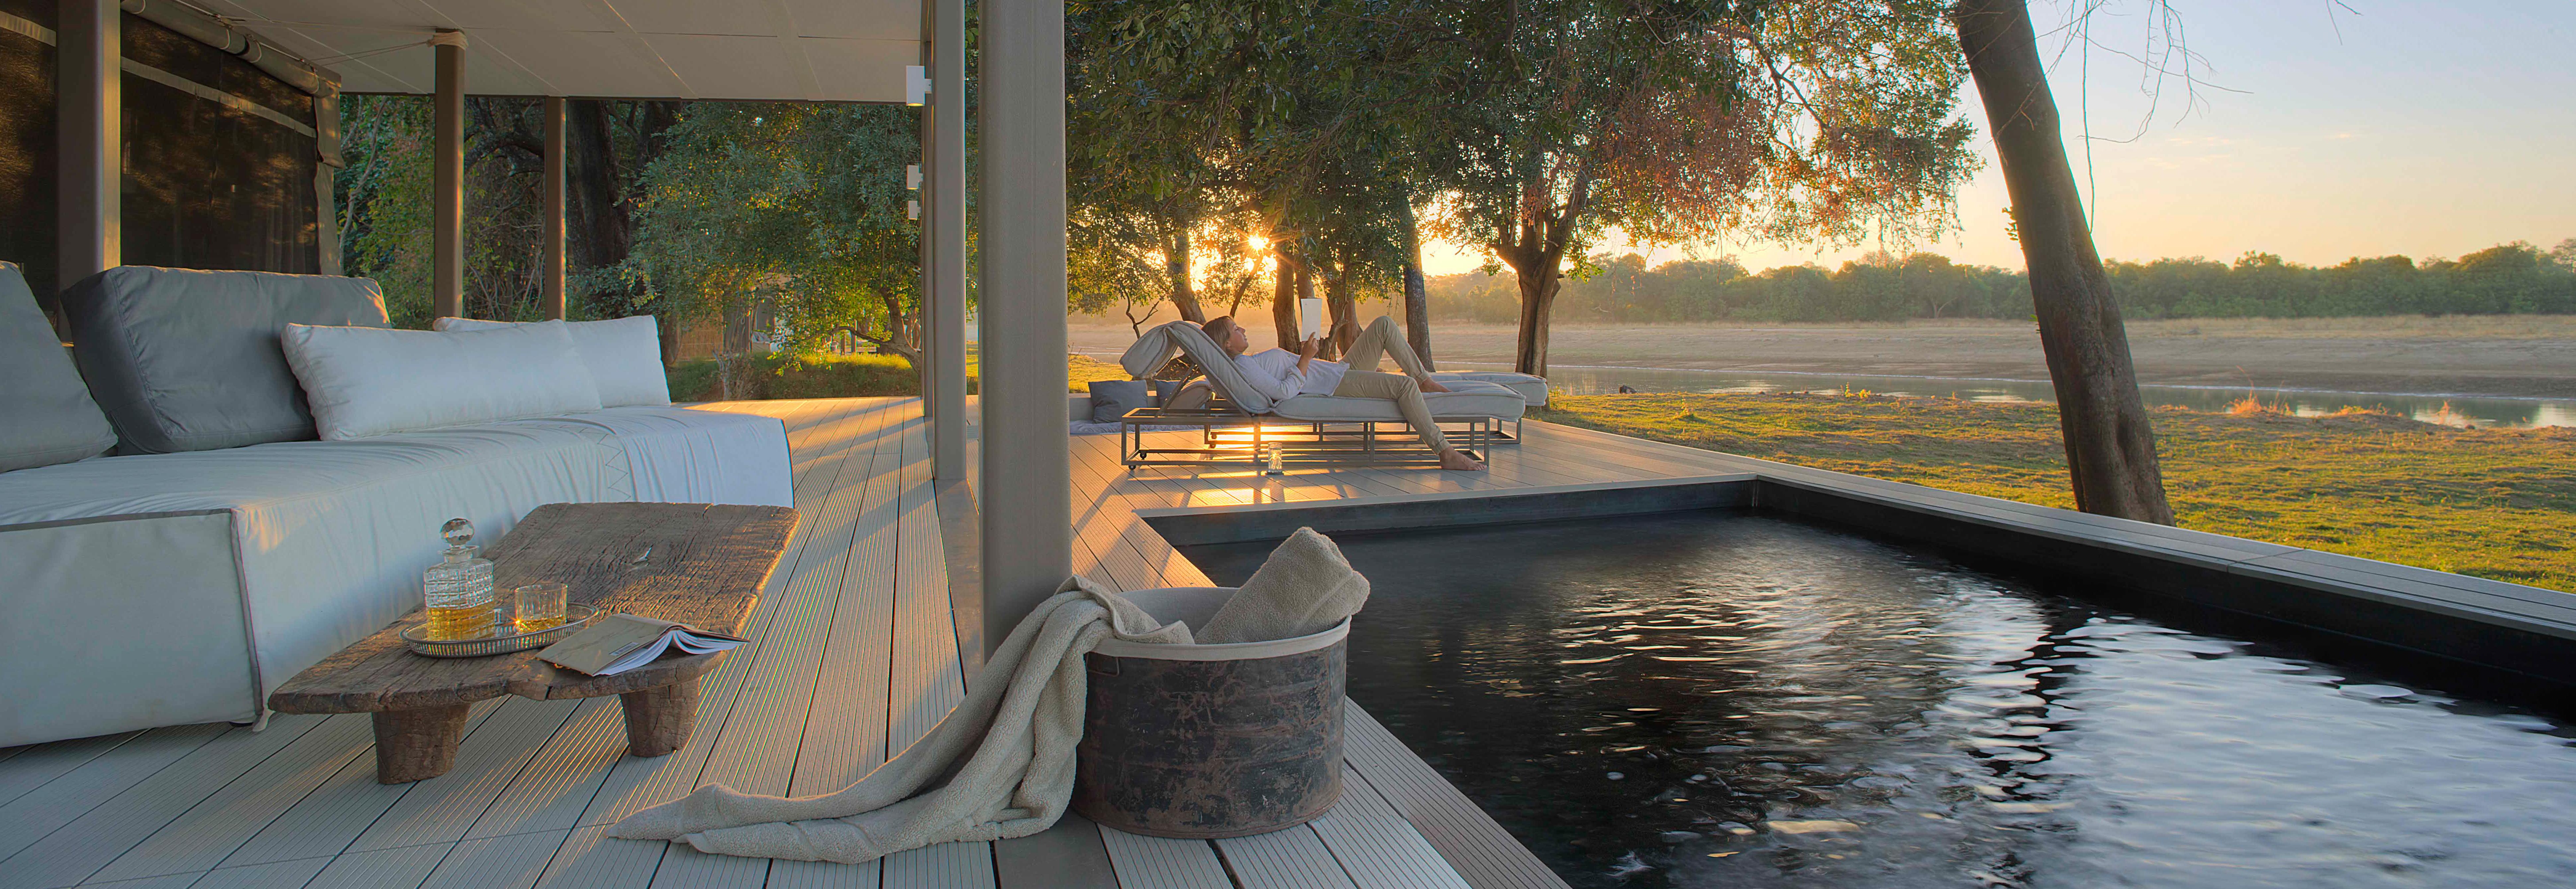 chinzombo-swimming-pool